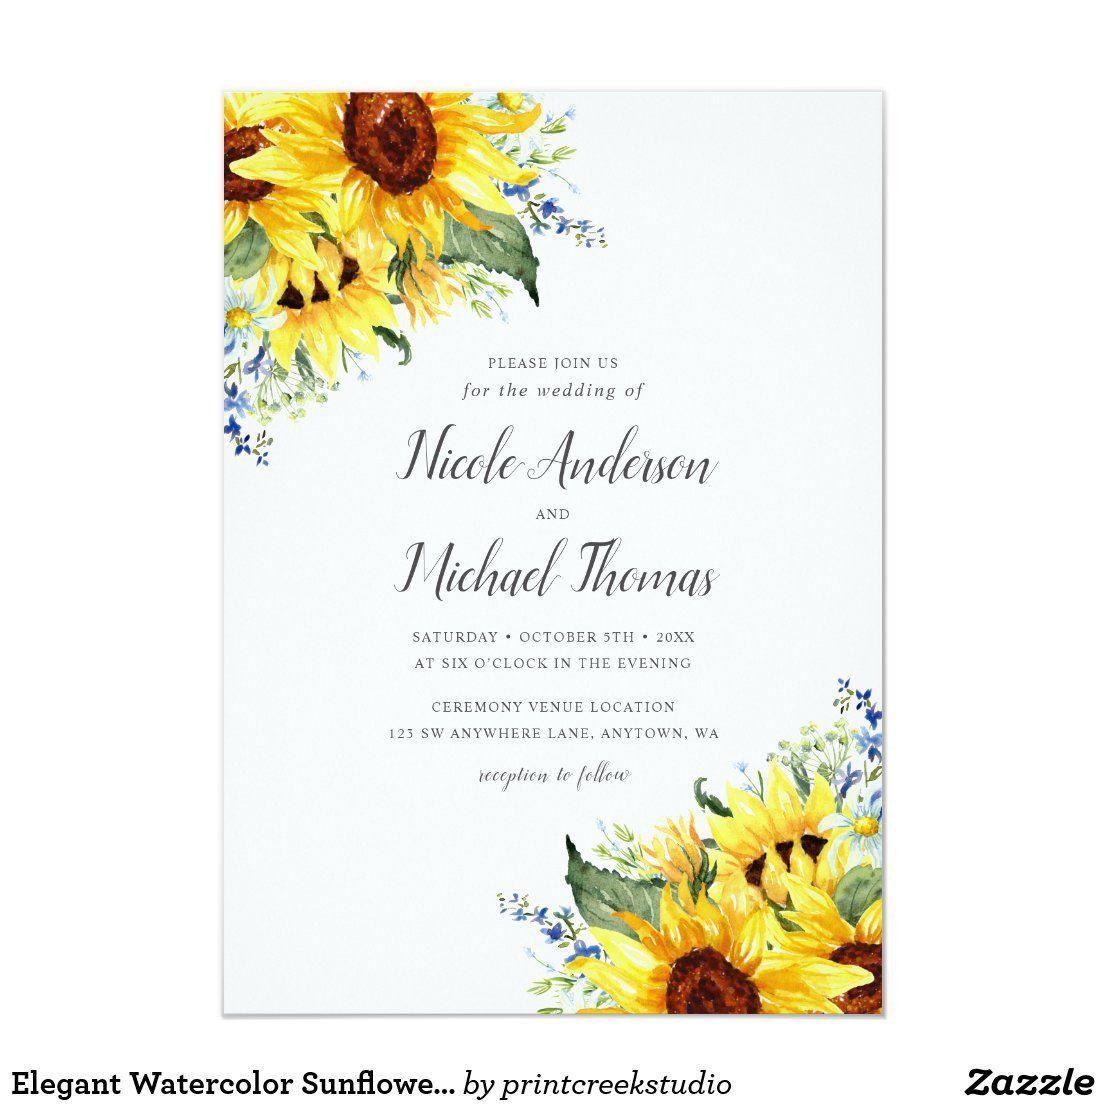 Elegant Watercolor Sunflowers Wedding Invitation in 2020